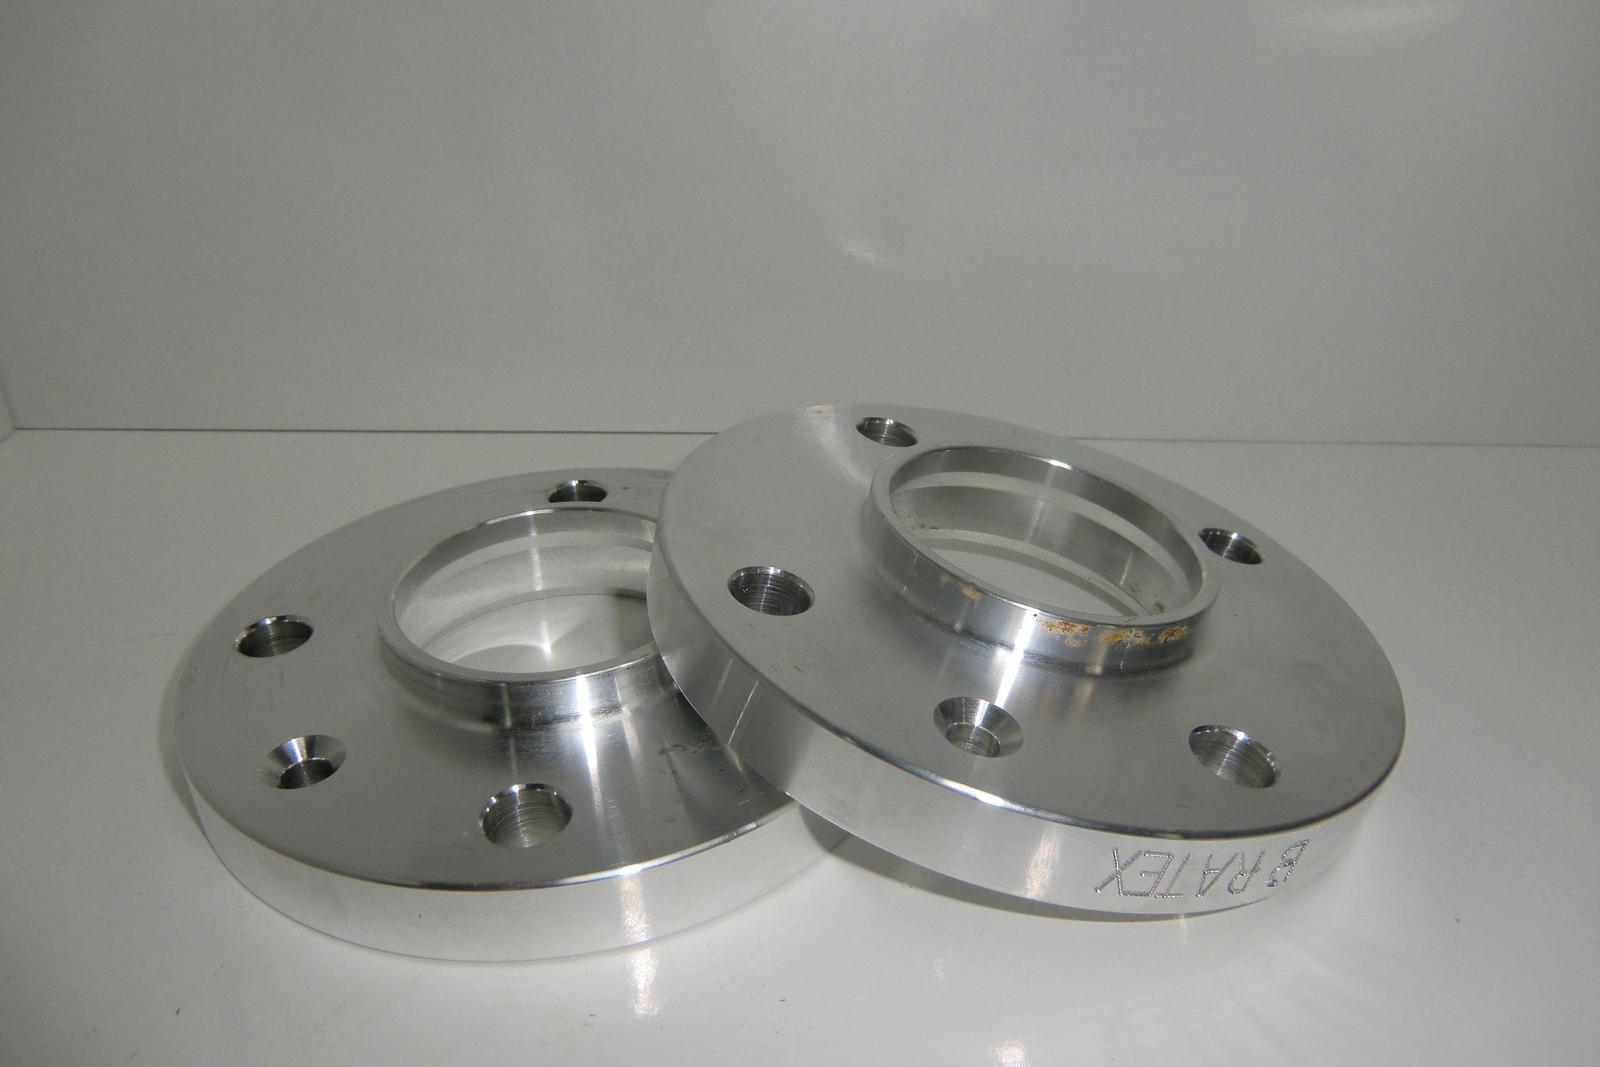 ELARGISSEURS DE VOIE ALUMINIUM 5 TROUS 20 mm